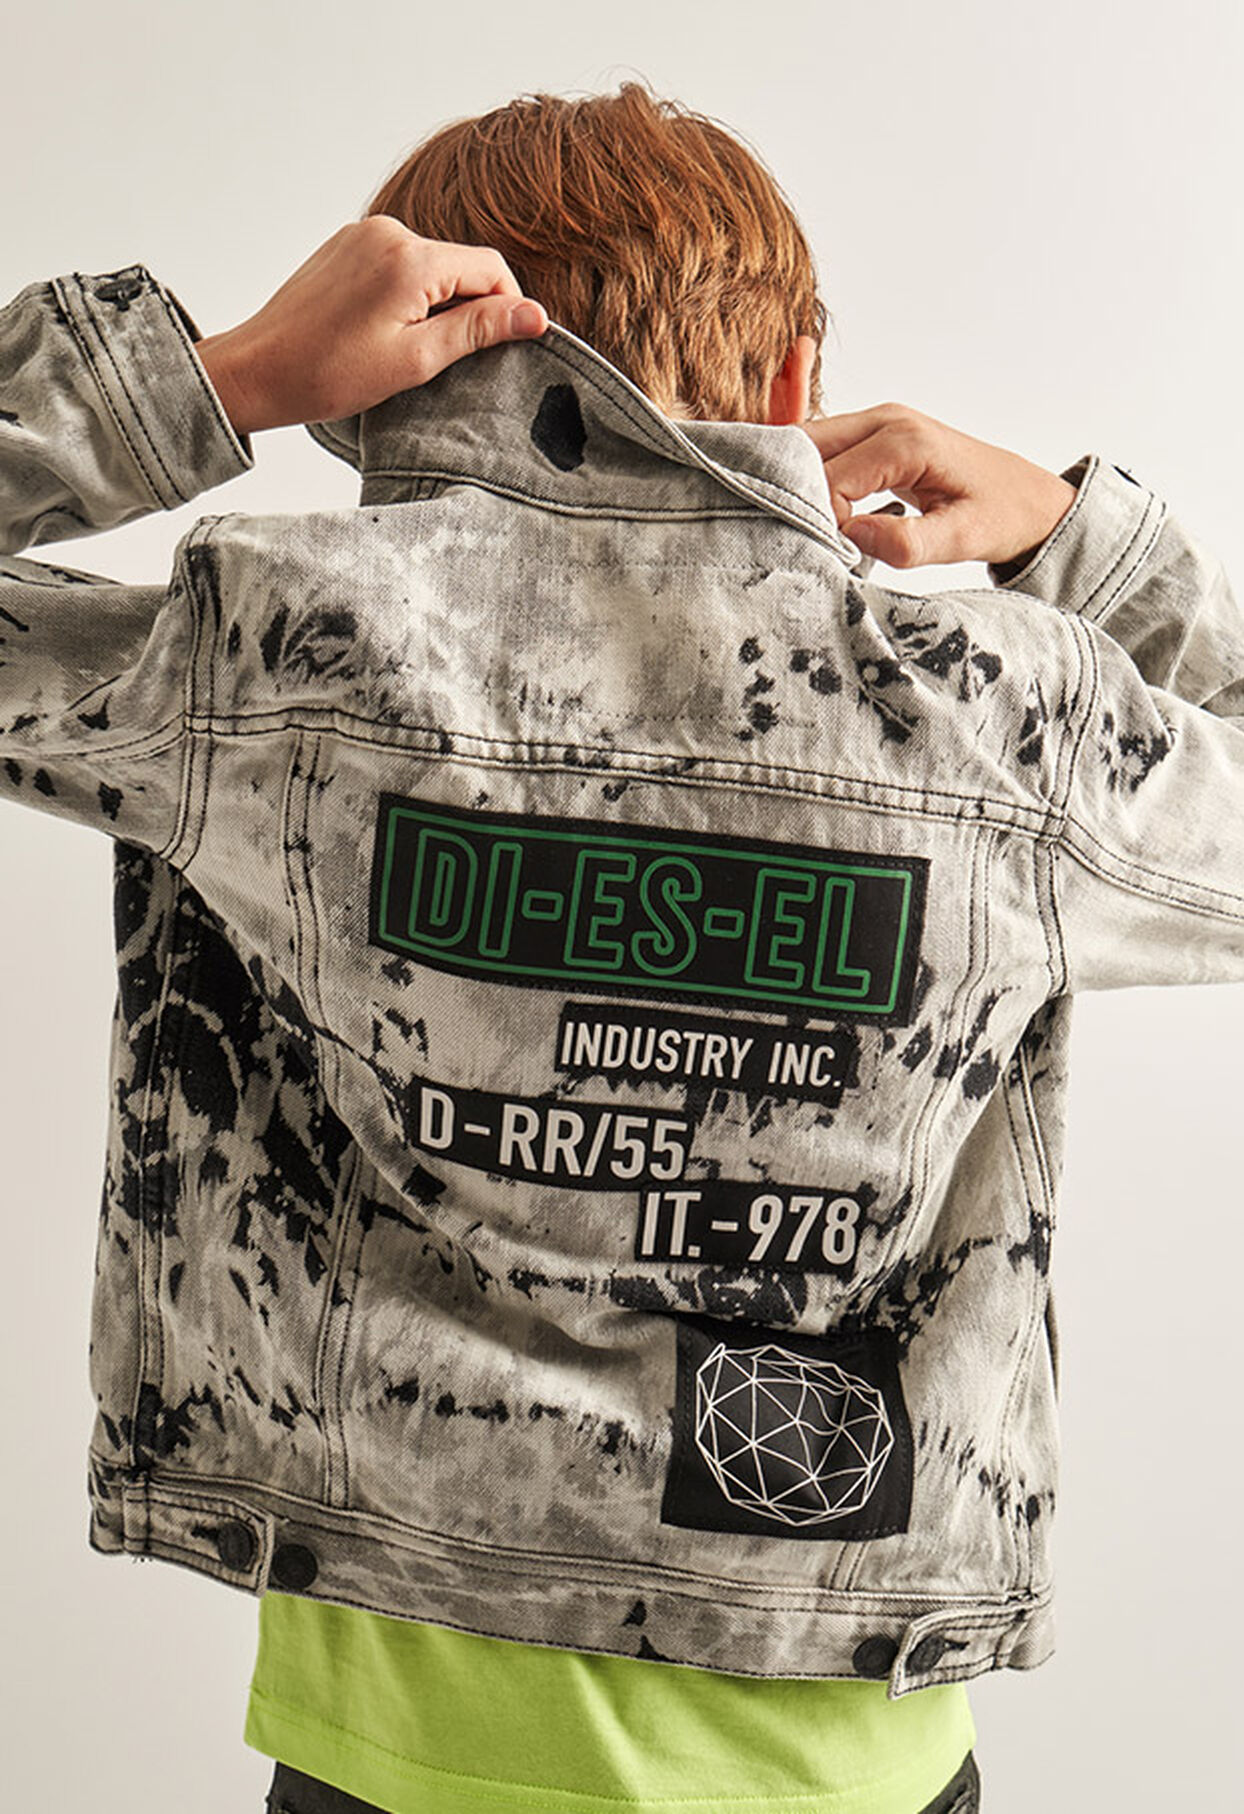 https://es.diesel.com/dw/image/v2/BBLG_PRD/on/demandware.static/-/Library-Sites-DieselMFSharedLibrary/default/dw9fd09078/CATEGORYOV/2x2_90.jpg?sw=1244&sh=1814